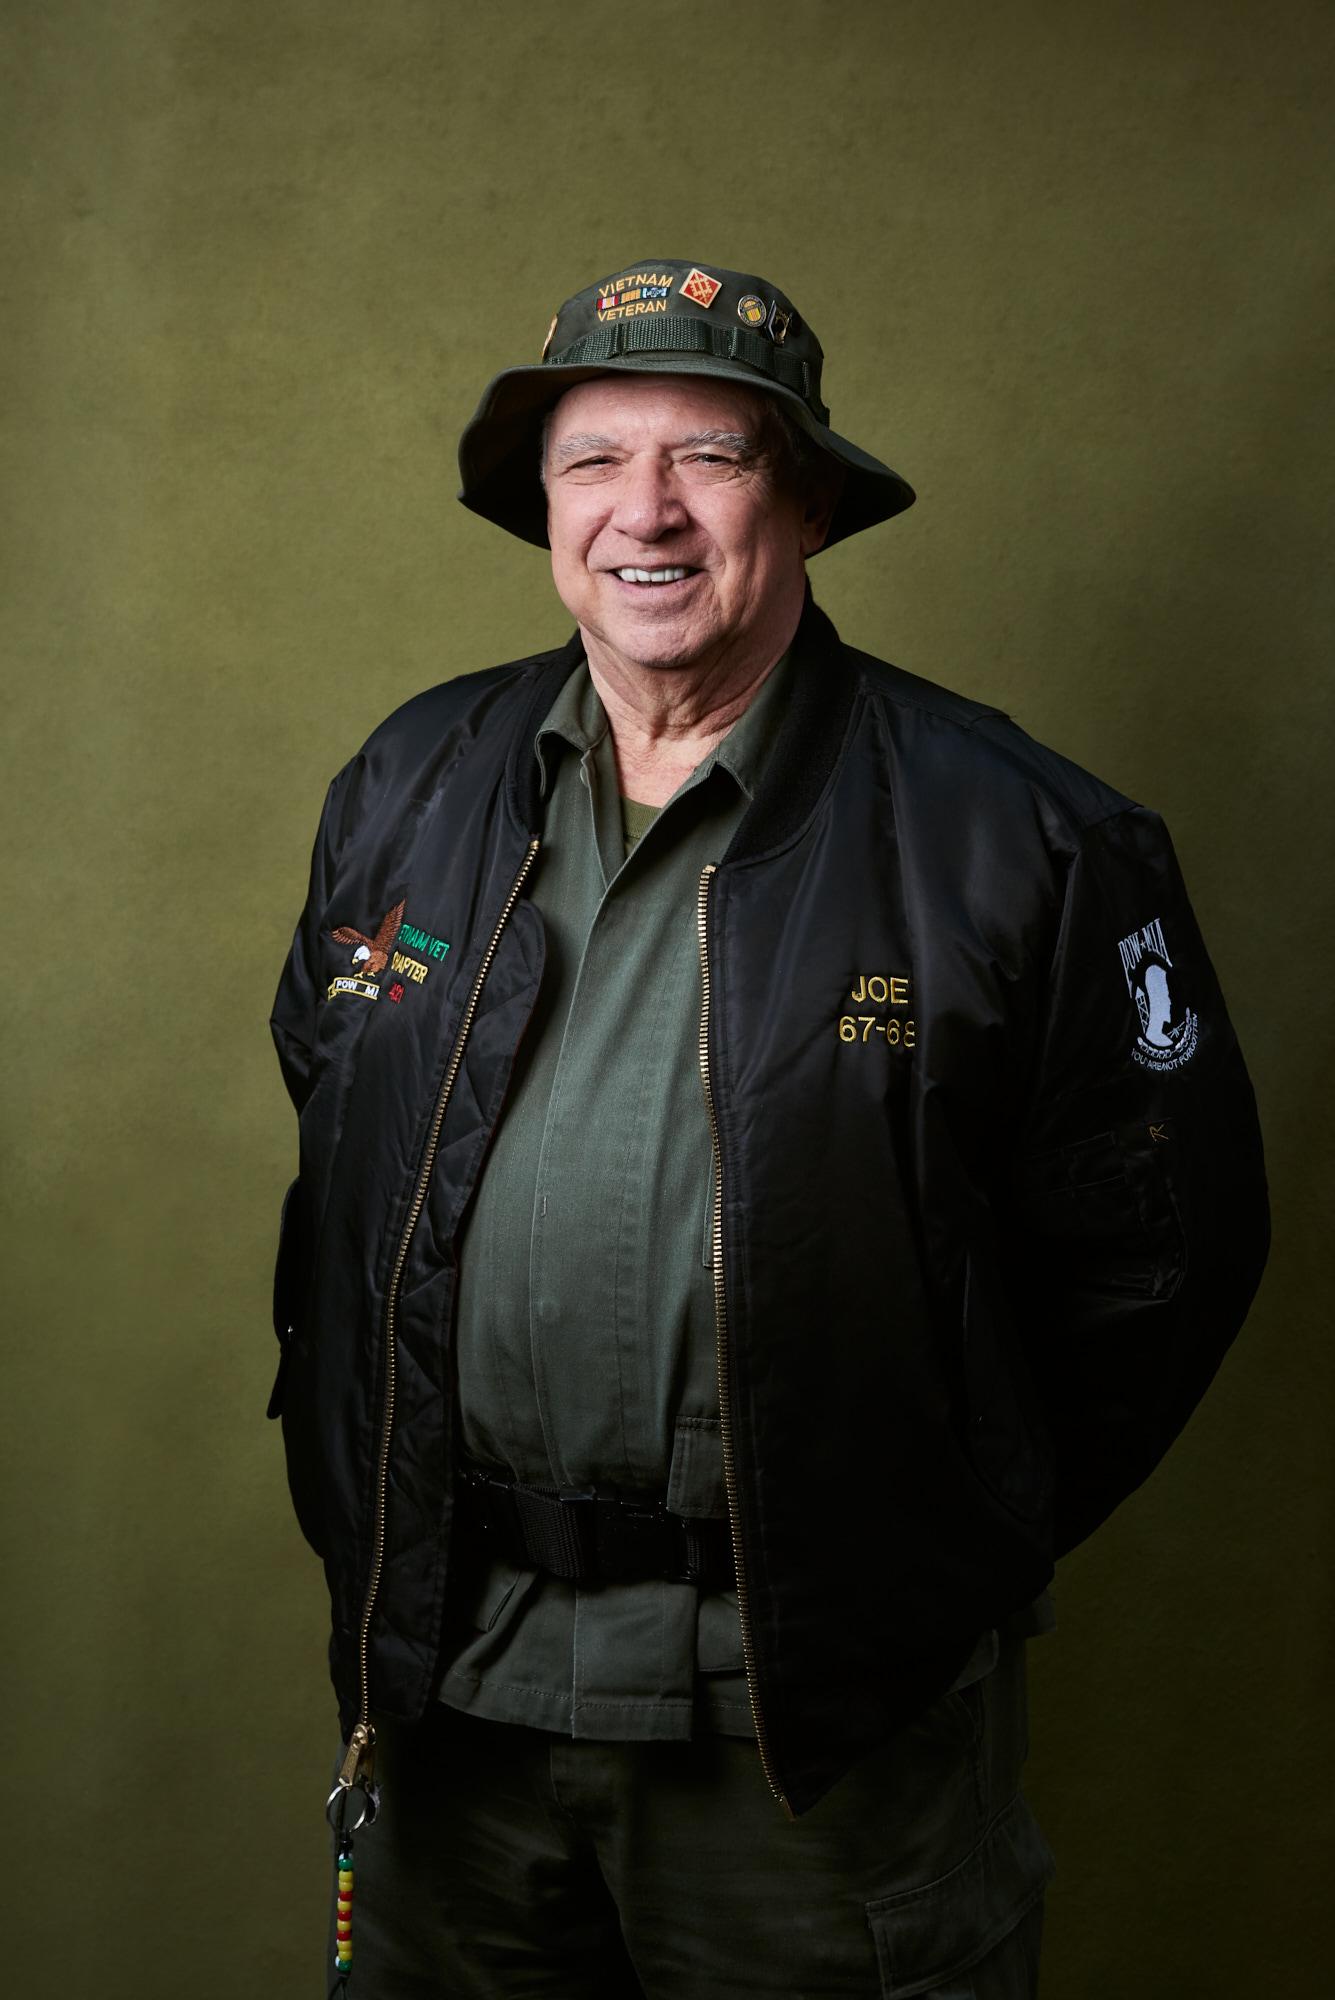 Sergeant Joe Librizzi